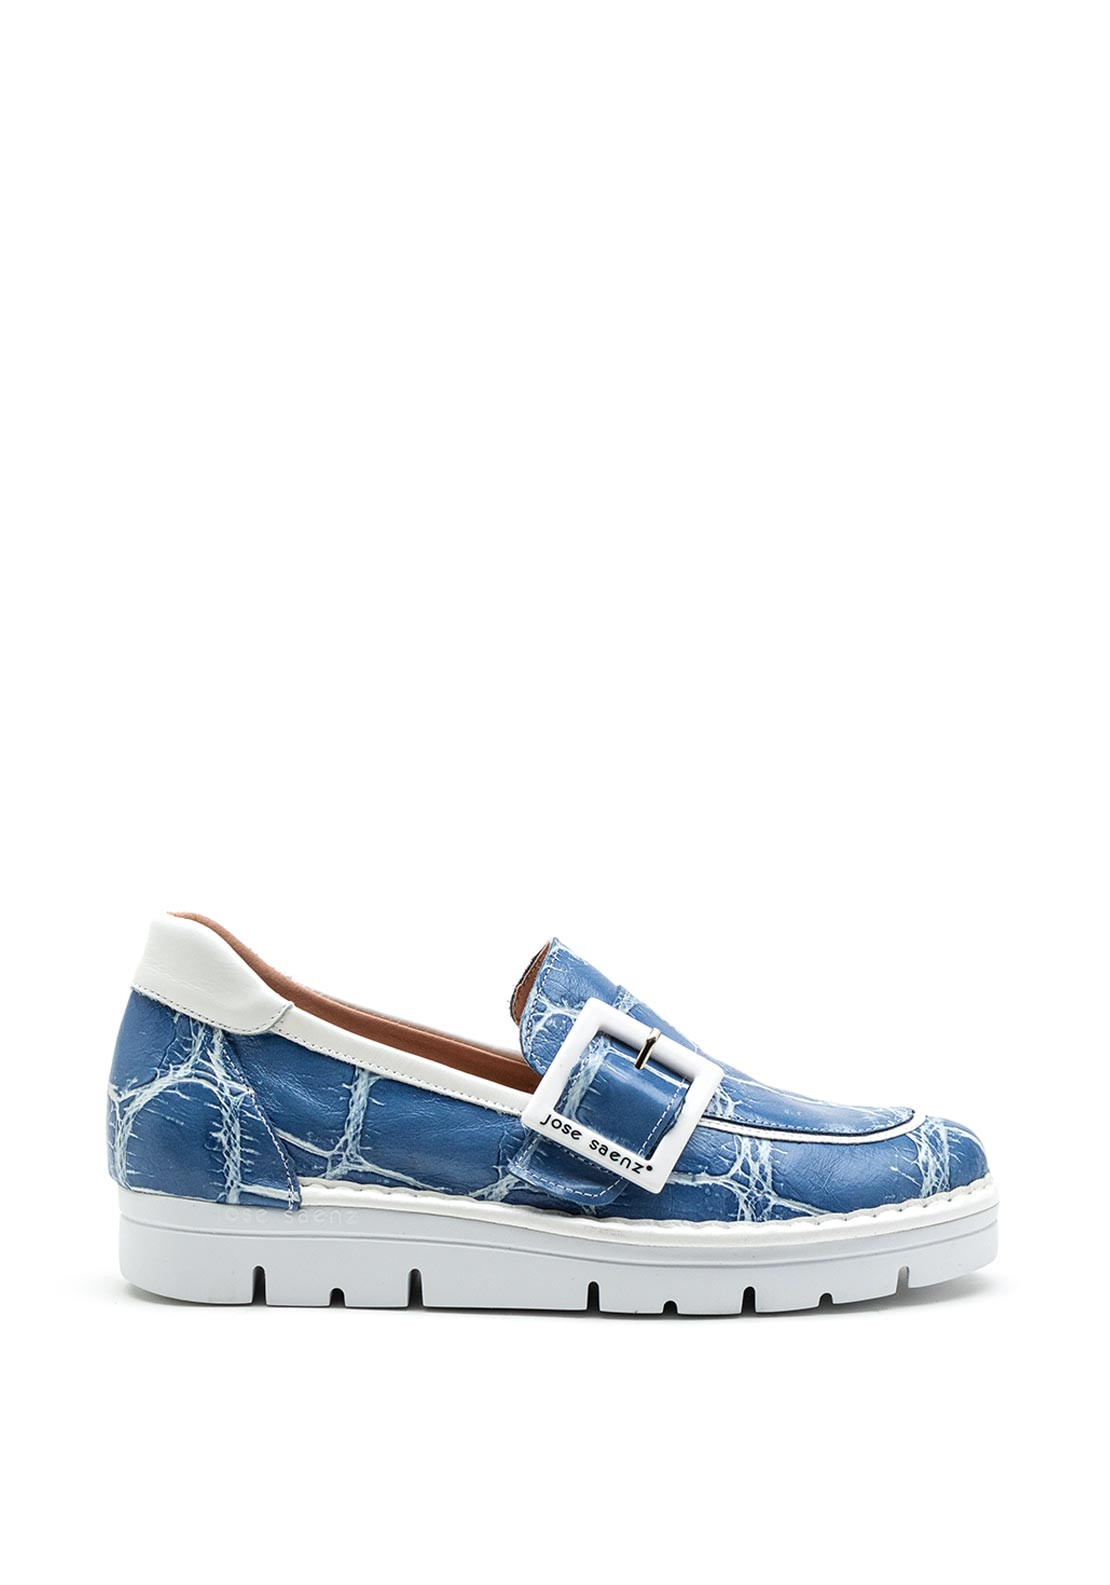 2017 Jose Saenz blue slip on shoe